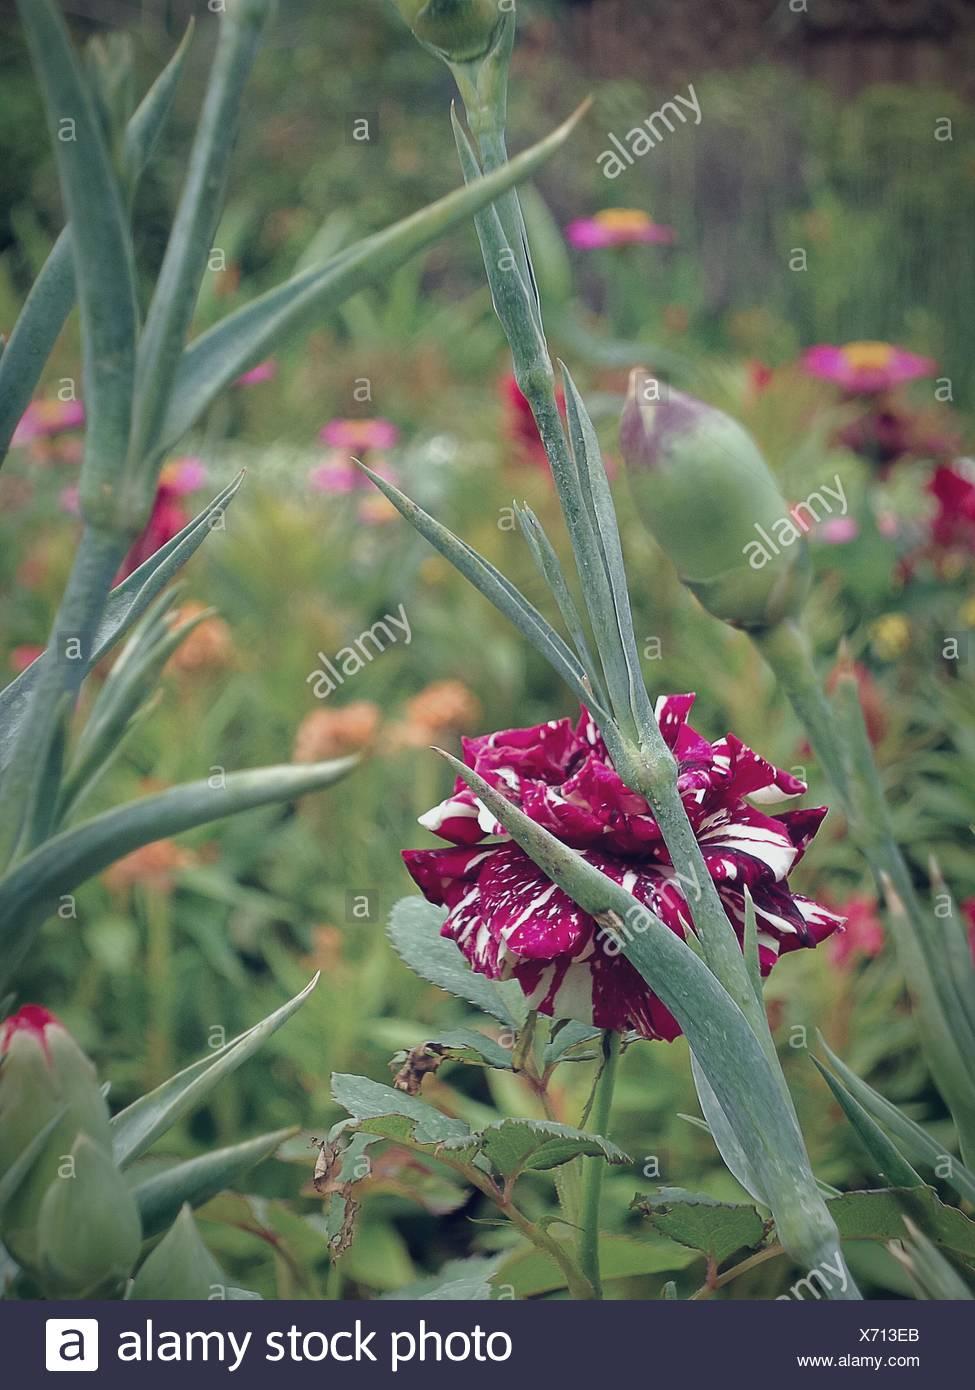 Fresh Magenta Flowers Blooming In Field - Stock Image